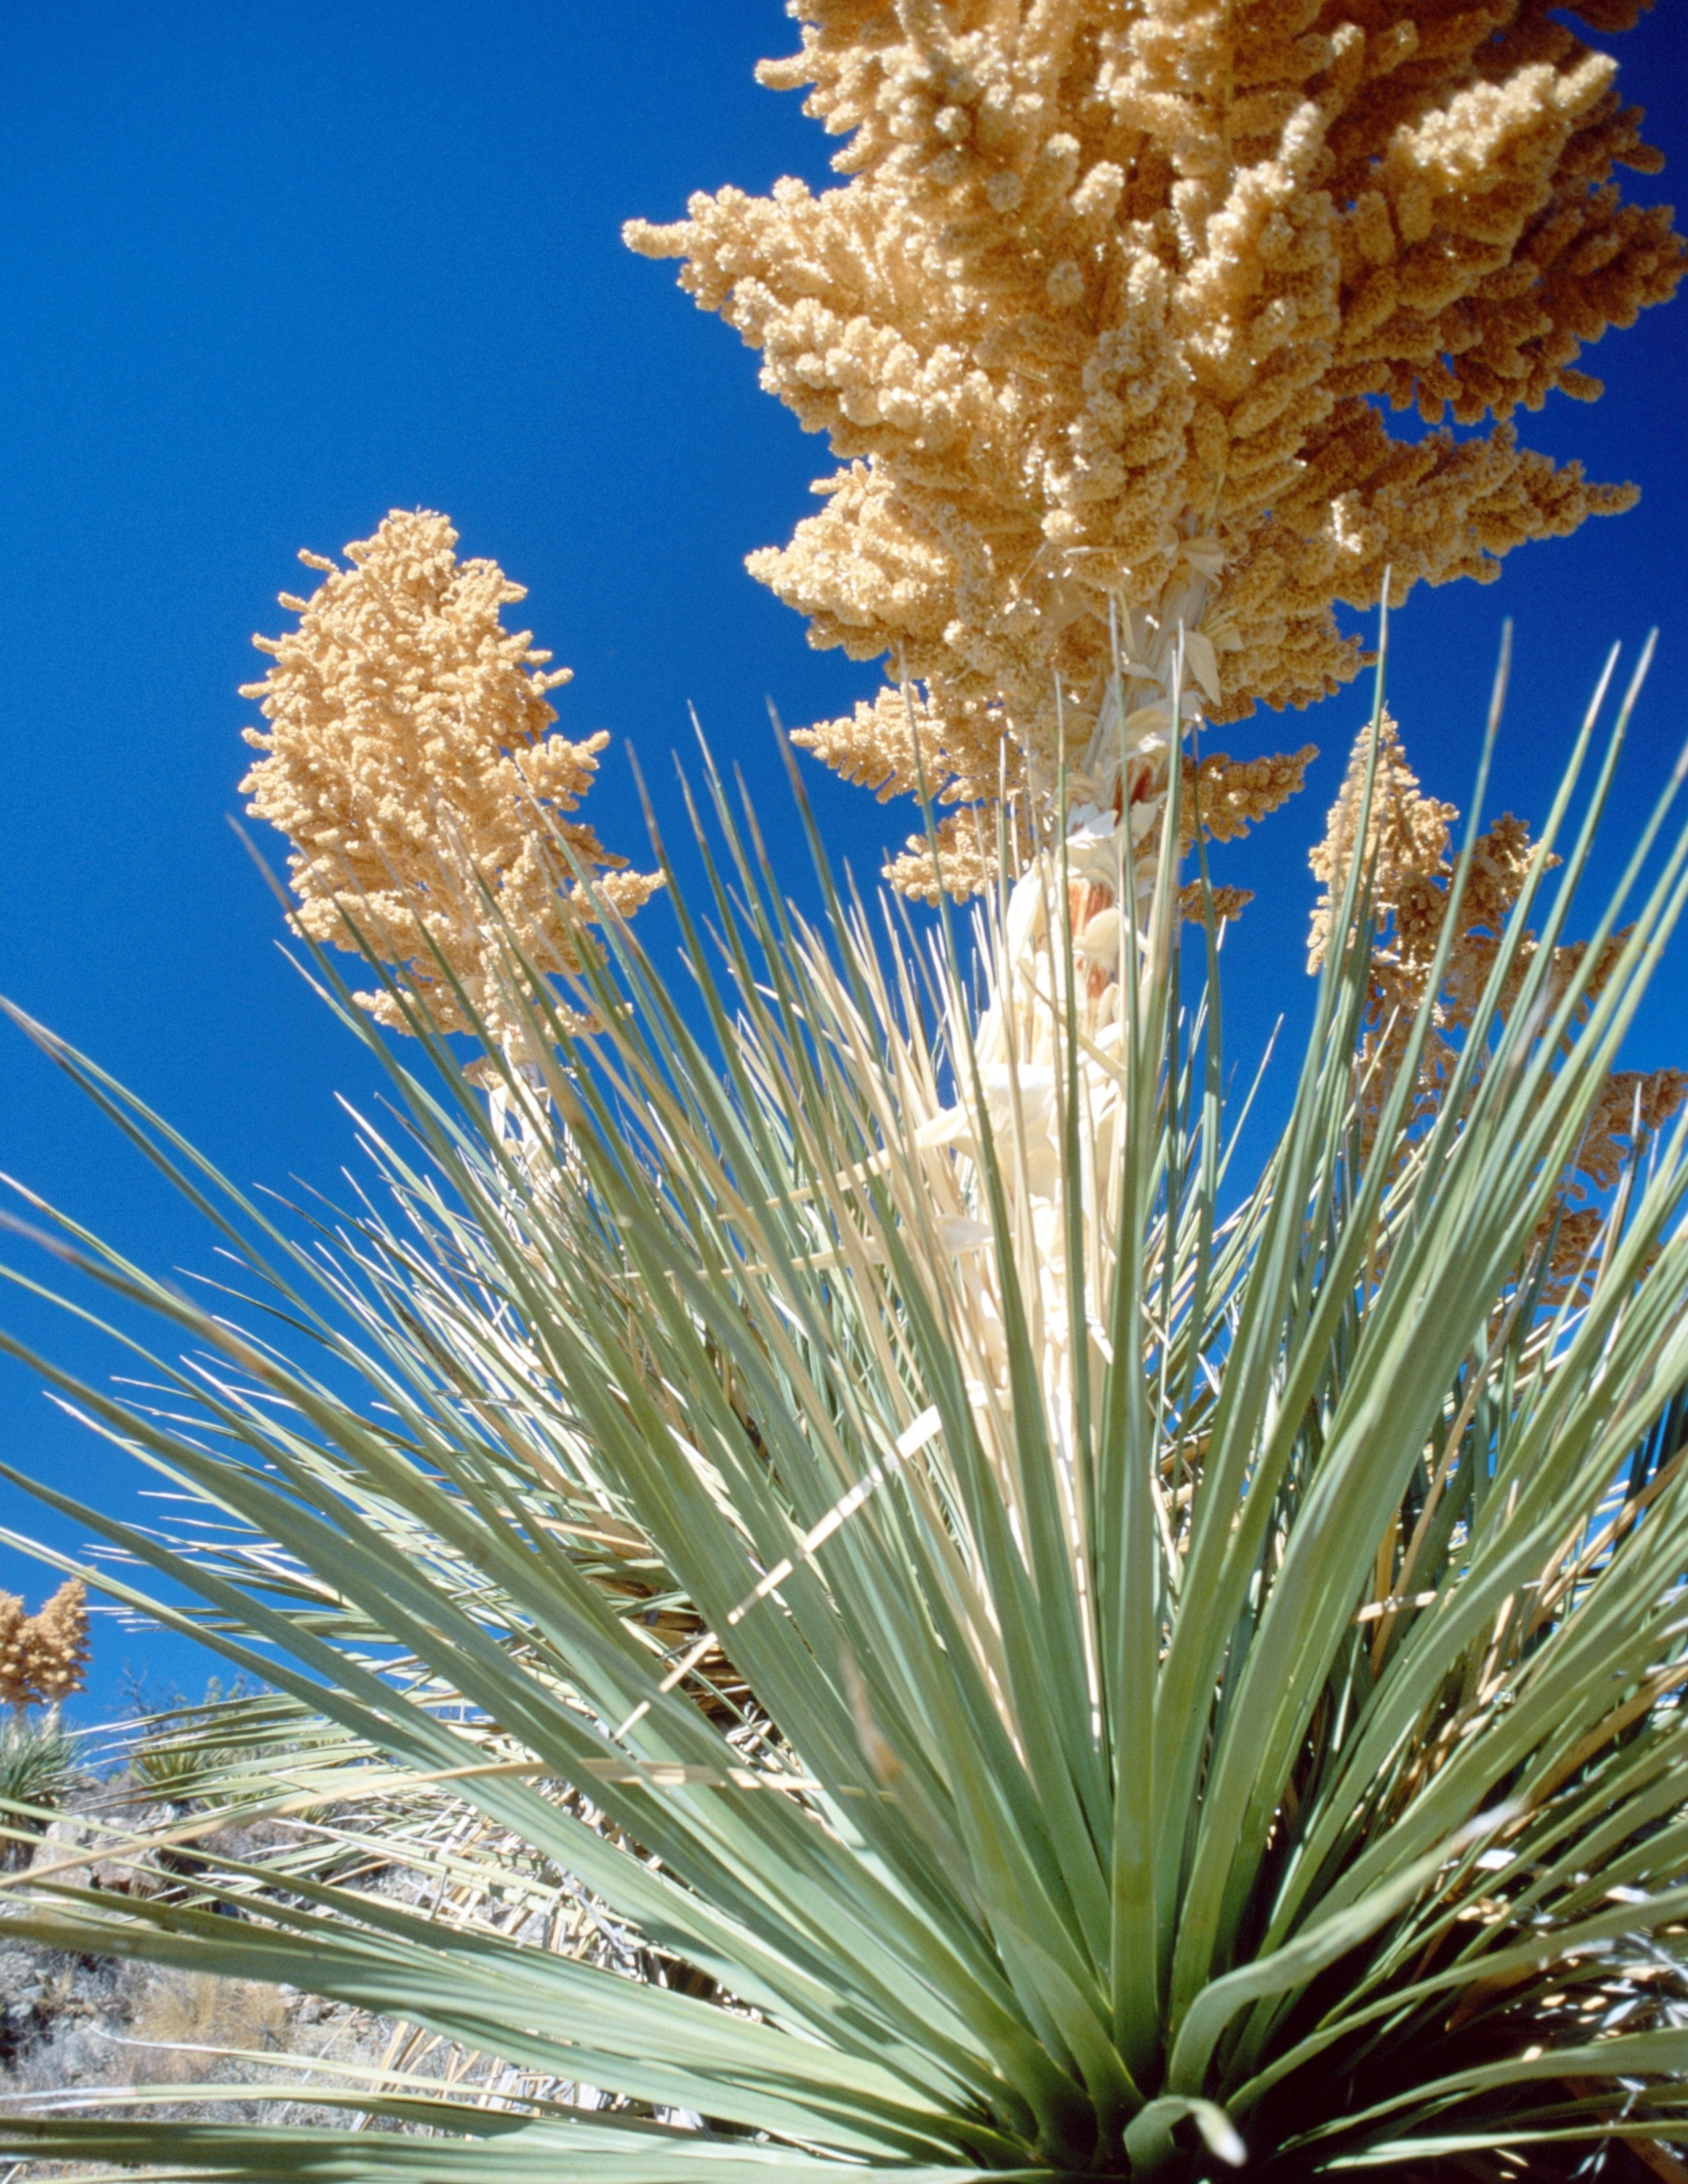 wild edible plants in arizona from semi arid to desert arizona